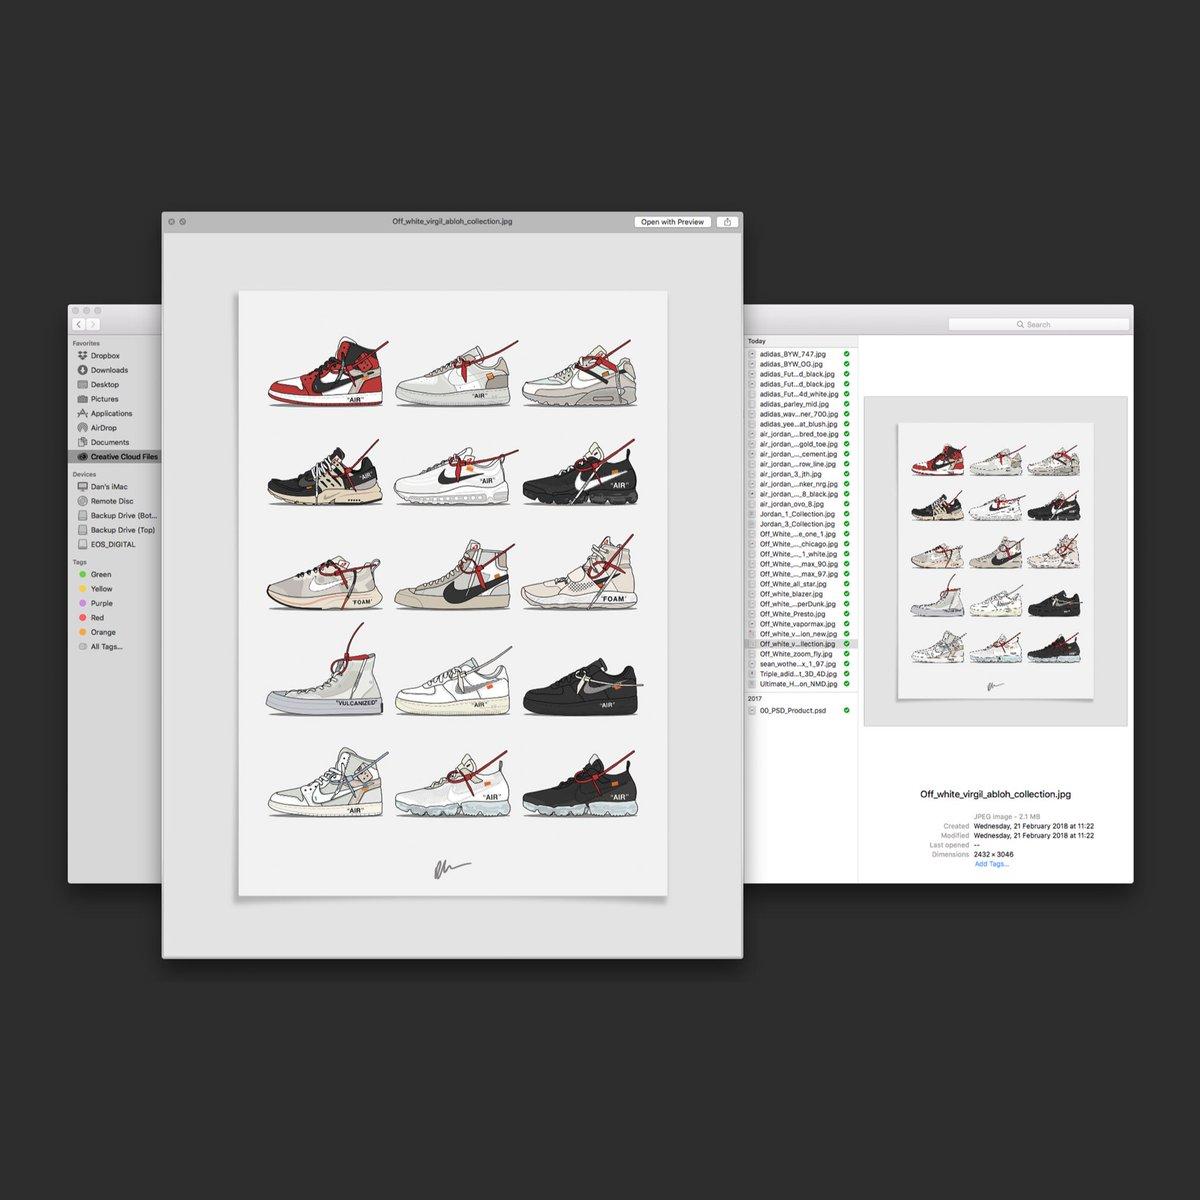 b429355aa968f KickPosters by Dan Freebairn on Twitter